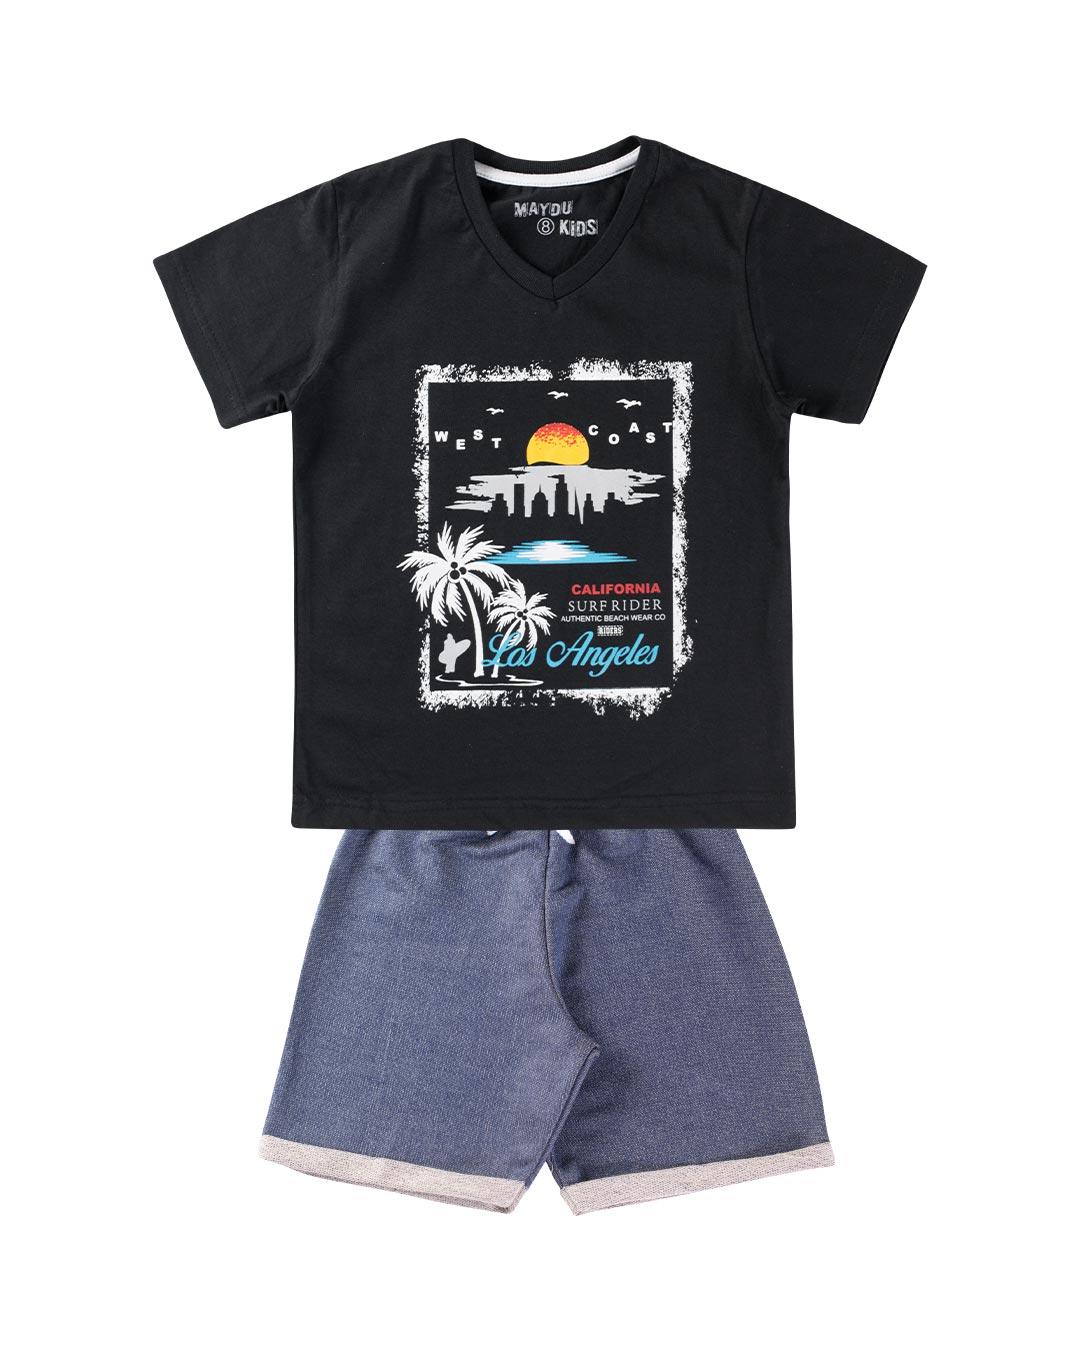 Conjunto Infantil West Coast - Maydu Kids